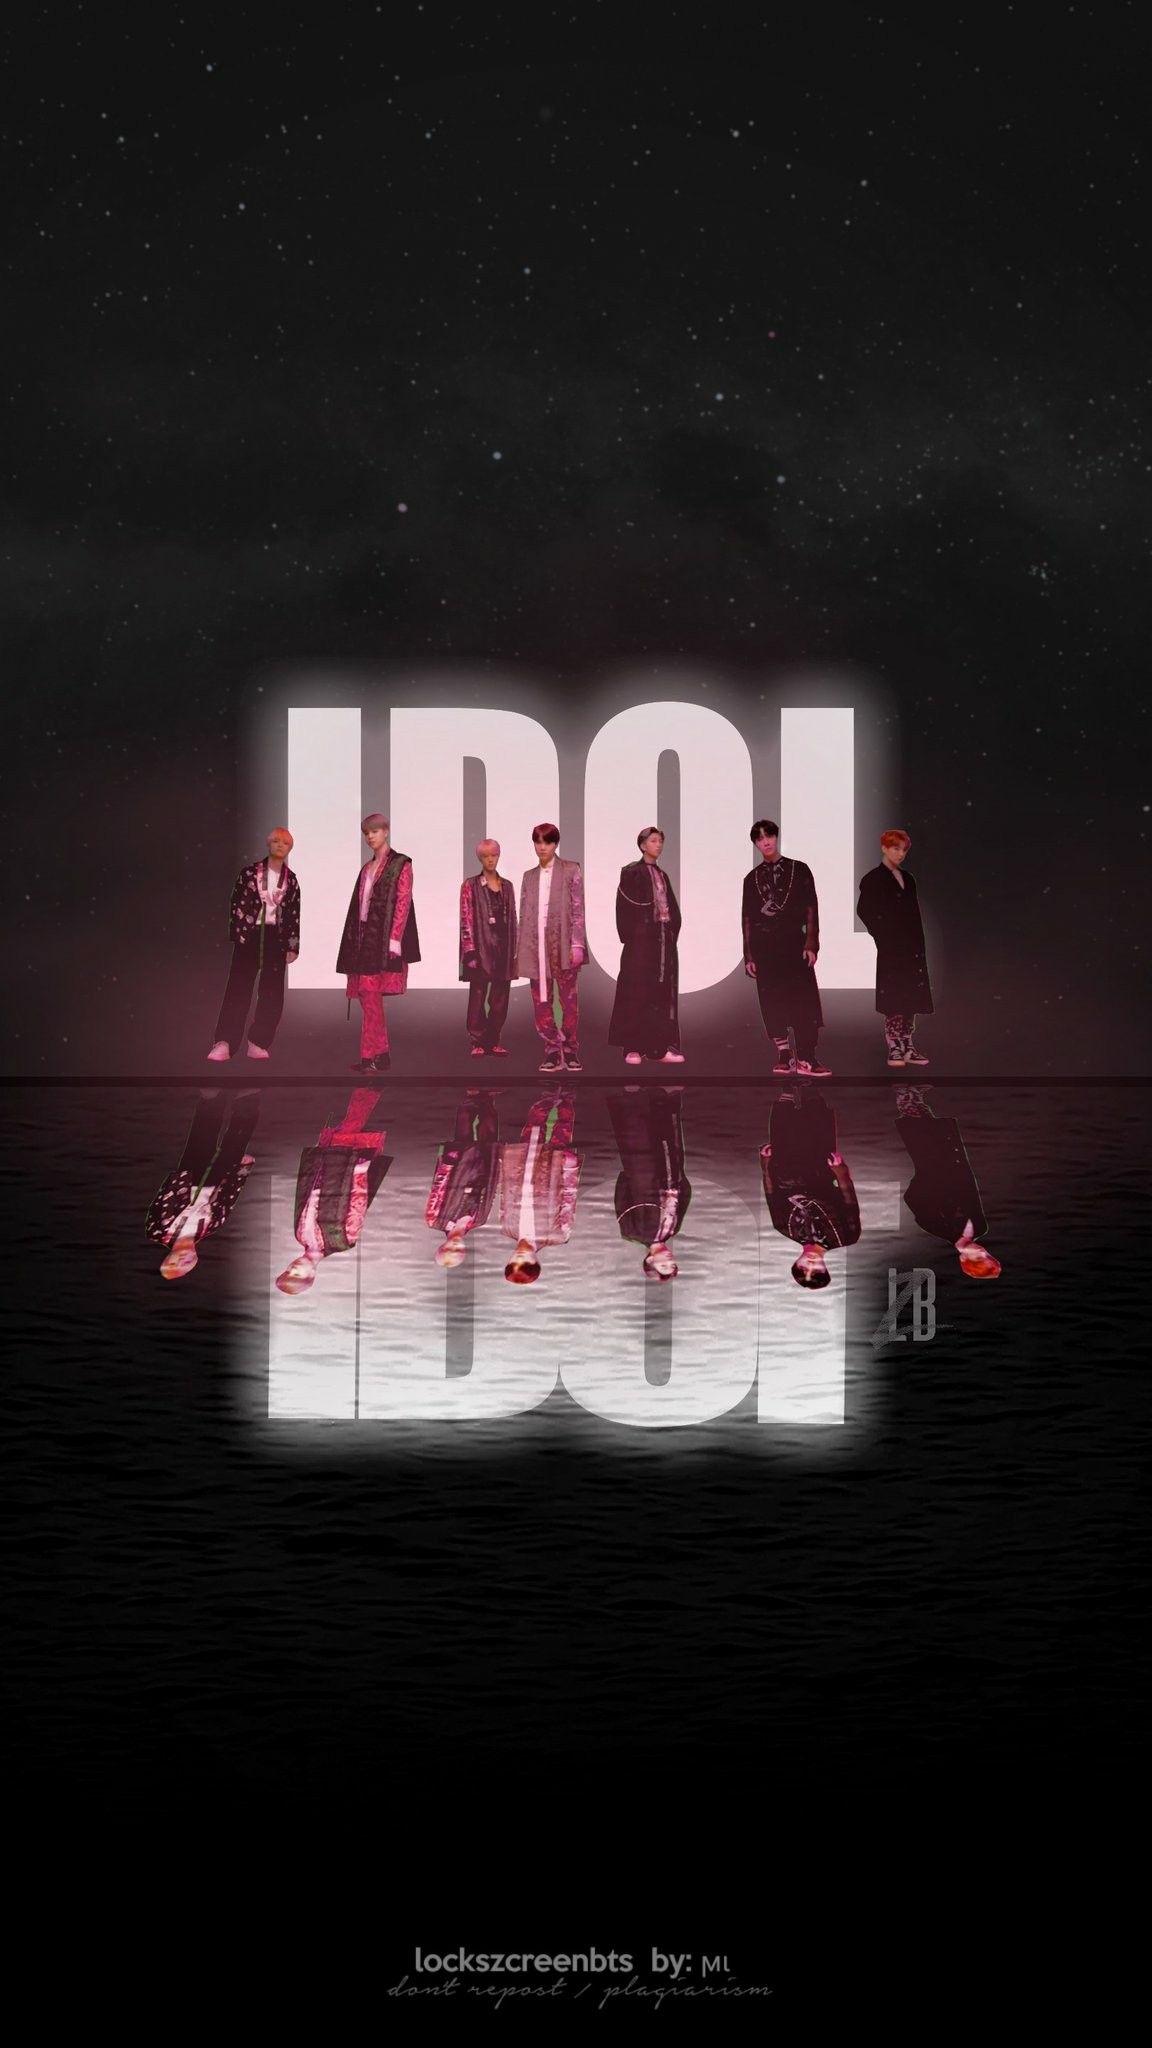 Bts idol wallpaper desktop